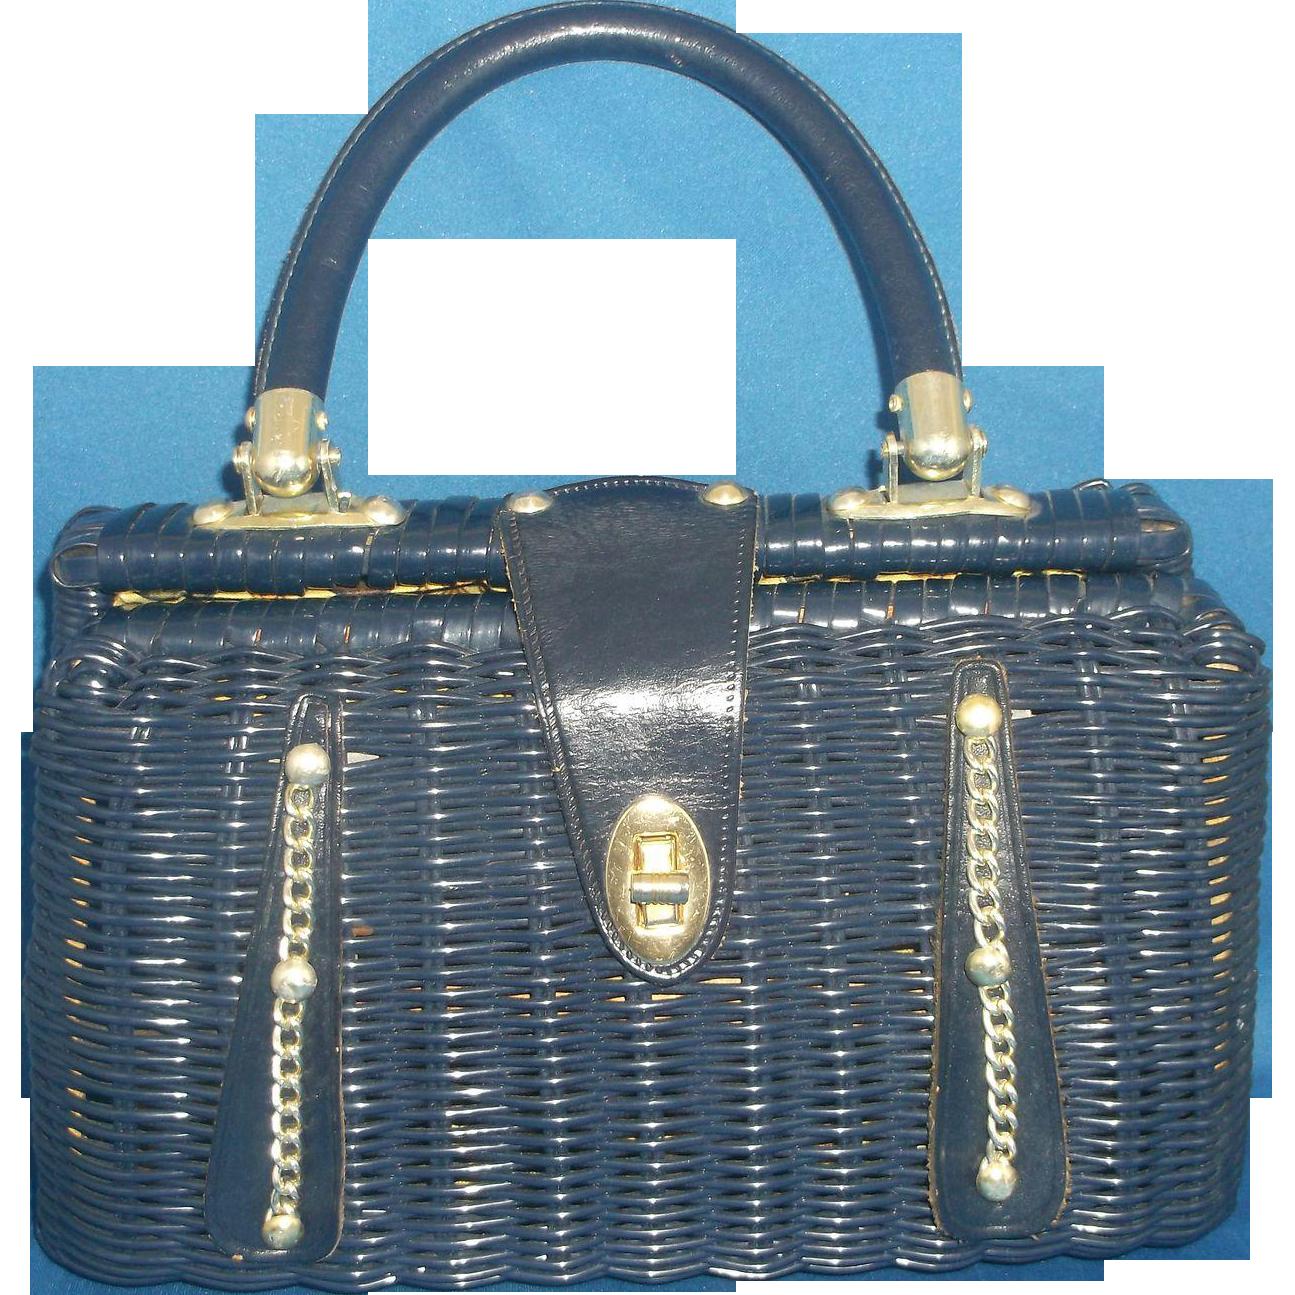 Navy Blue Wicker Basket Purse Made in Hong Kong Cheri